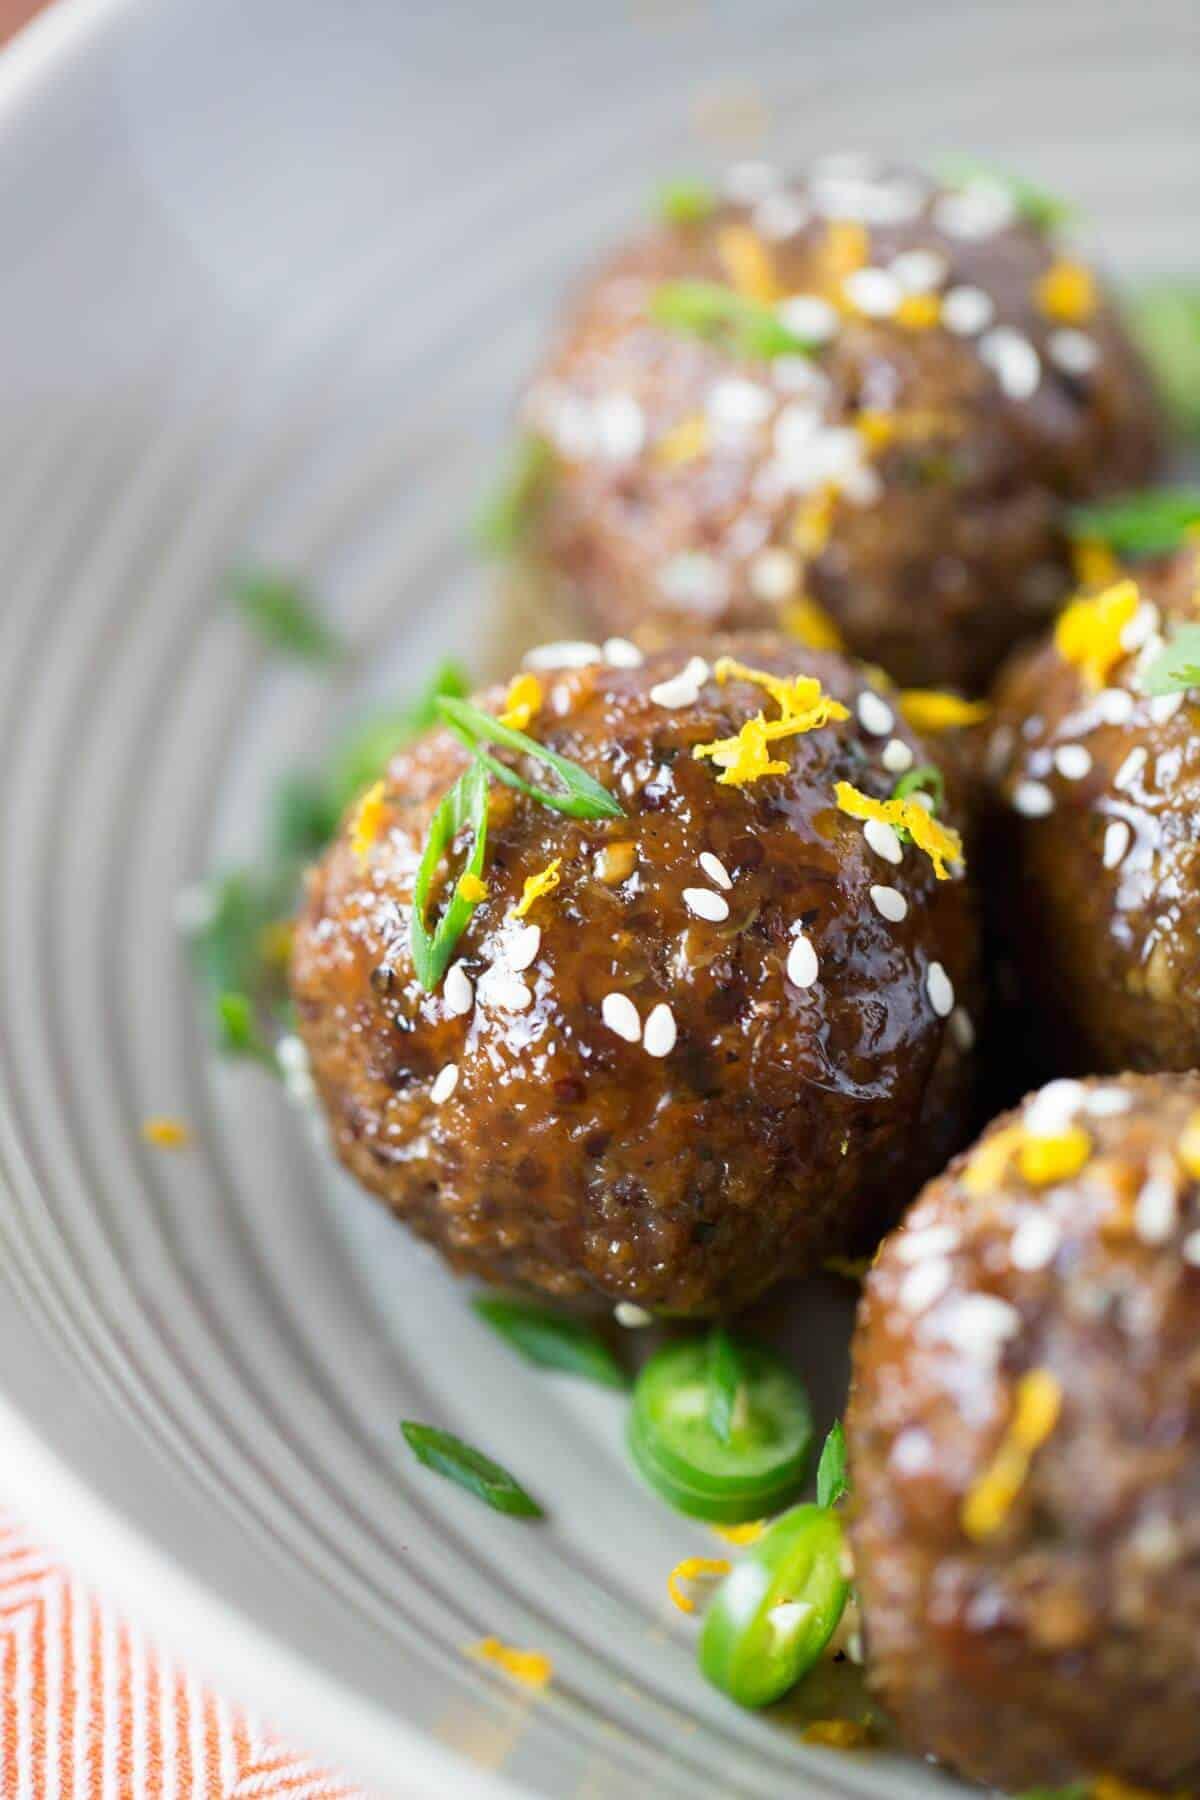 Asian Spiced Quinoa Meatballs with Orange Zest | jessicagavin.com #chineserecipe